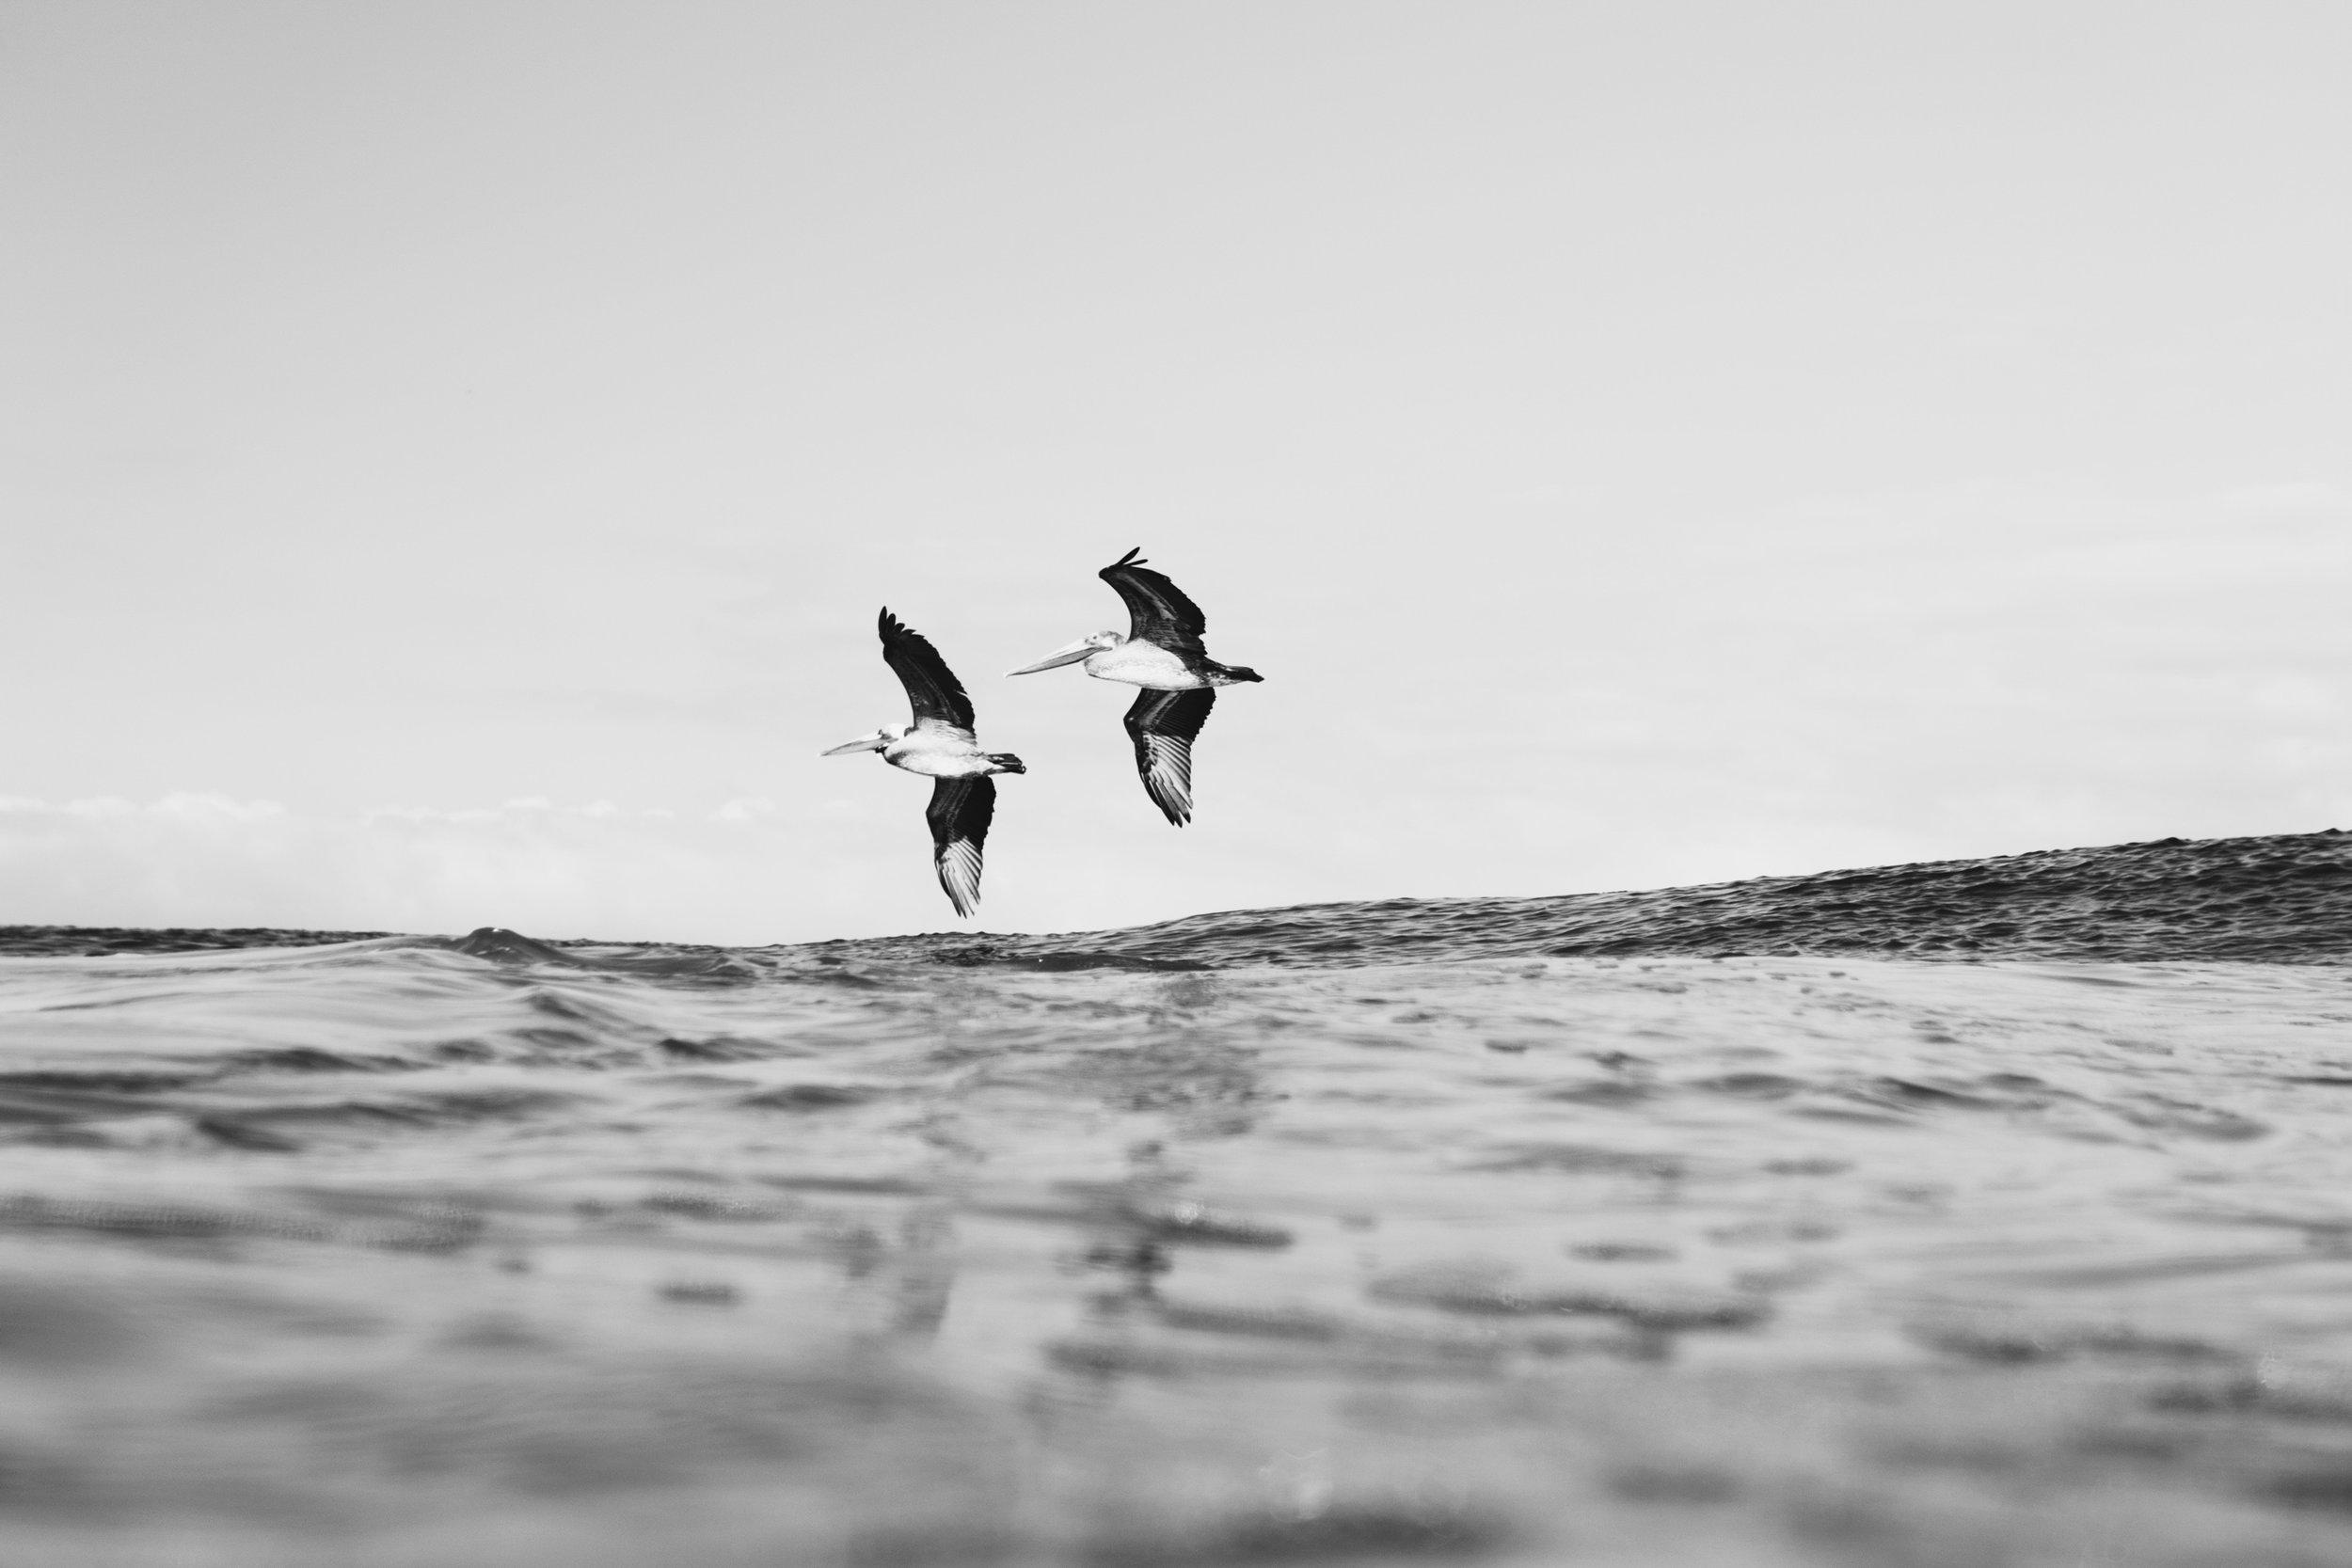 Surf-Mexico-Zihuatanejo-Sayulita-Ixtapa-Zihuatanejo-Diego-Cadena-Olas-Fotografia-Heiko-Bothe-80.jpg